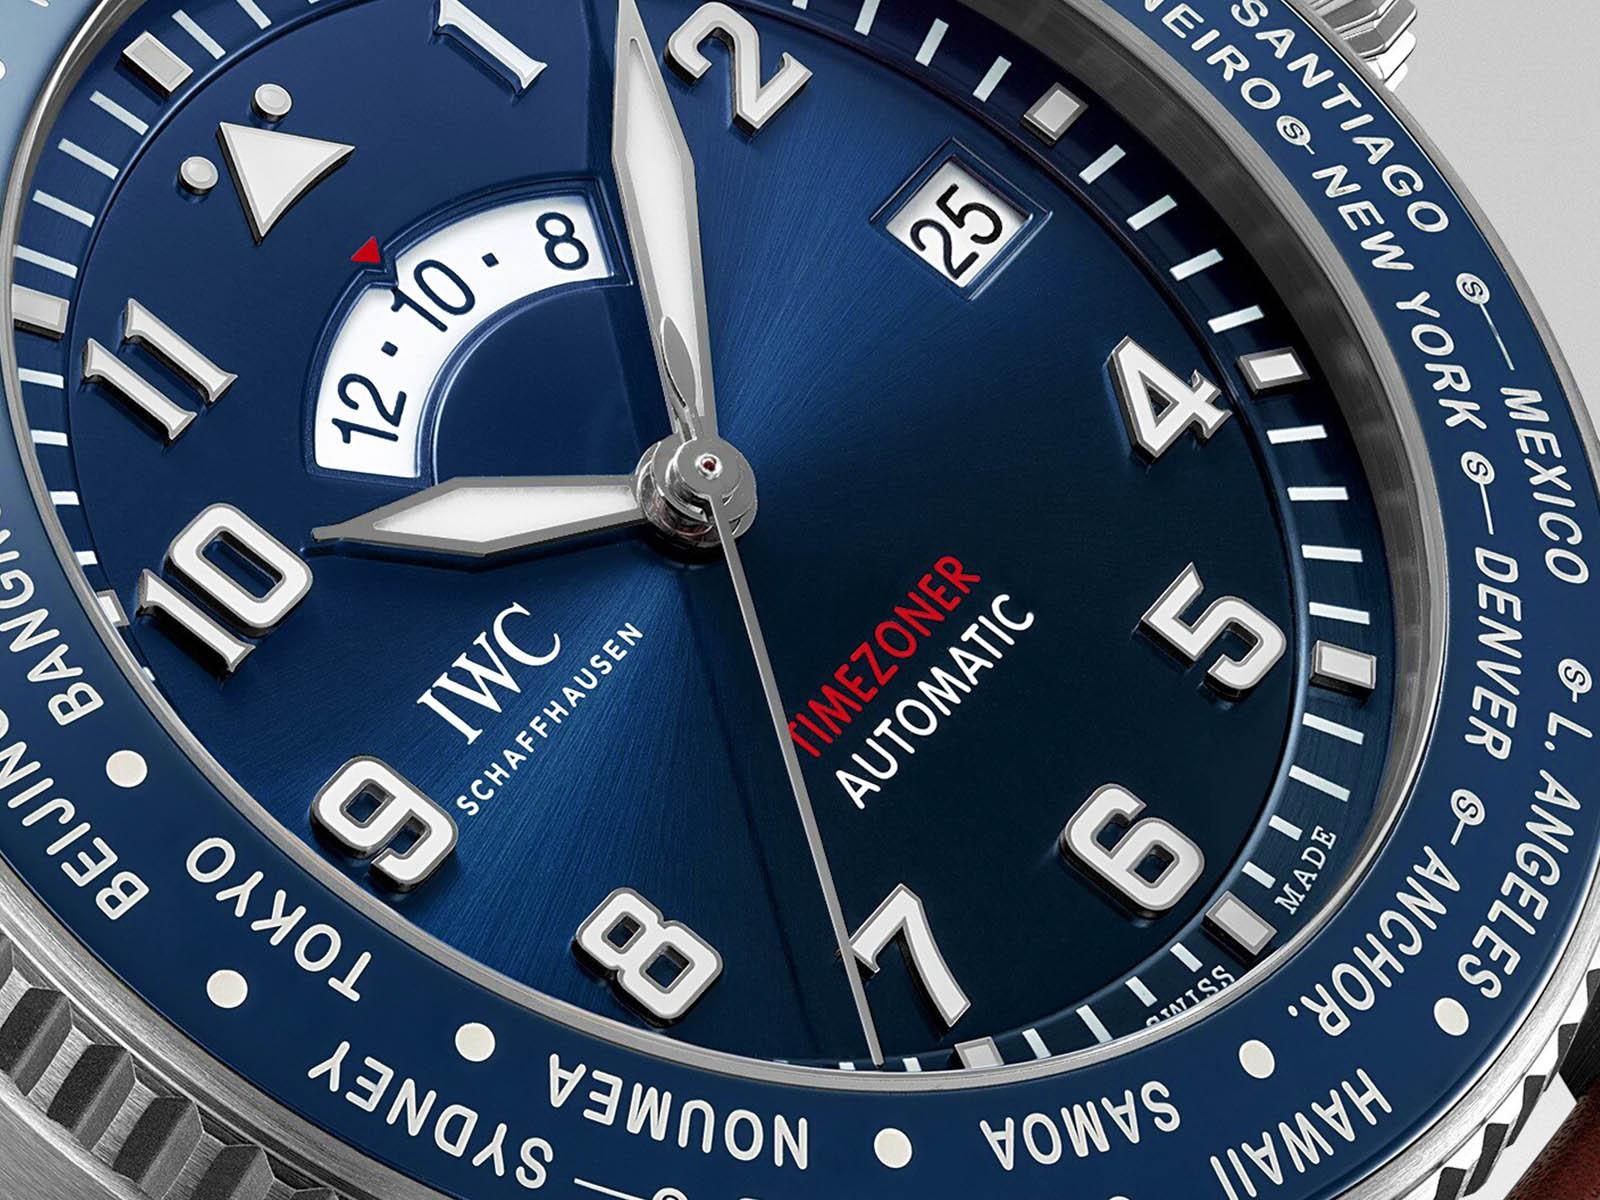 iw395503-iwc-pilot-s-watch-timezoner-edition-le-petit-prince-4.jpg